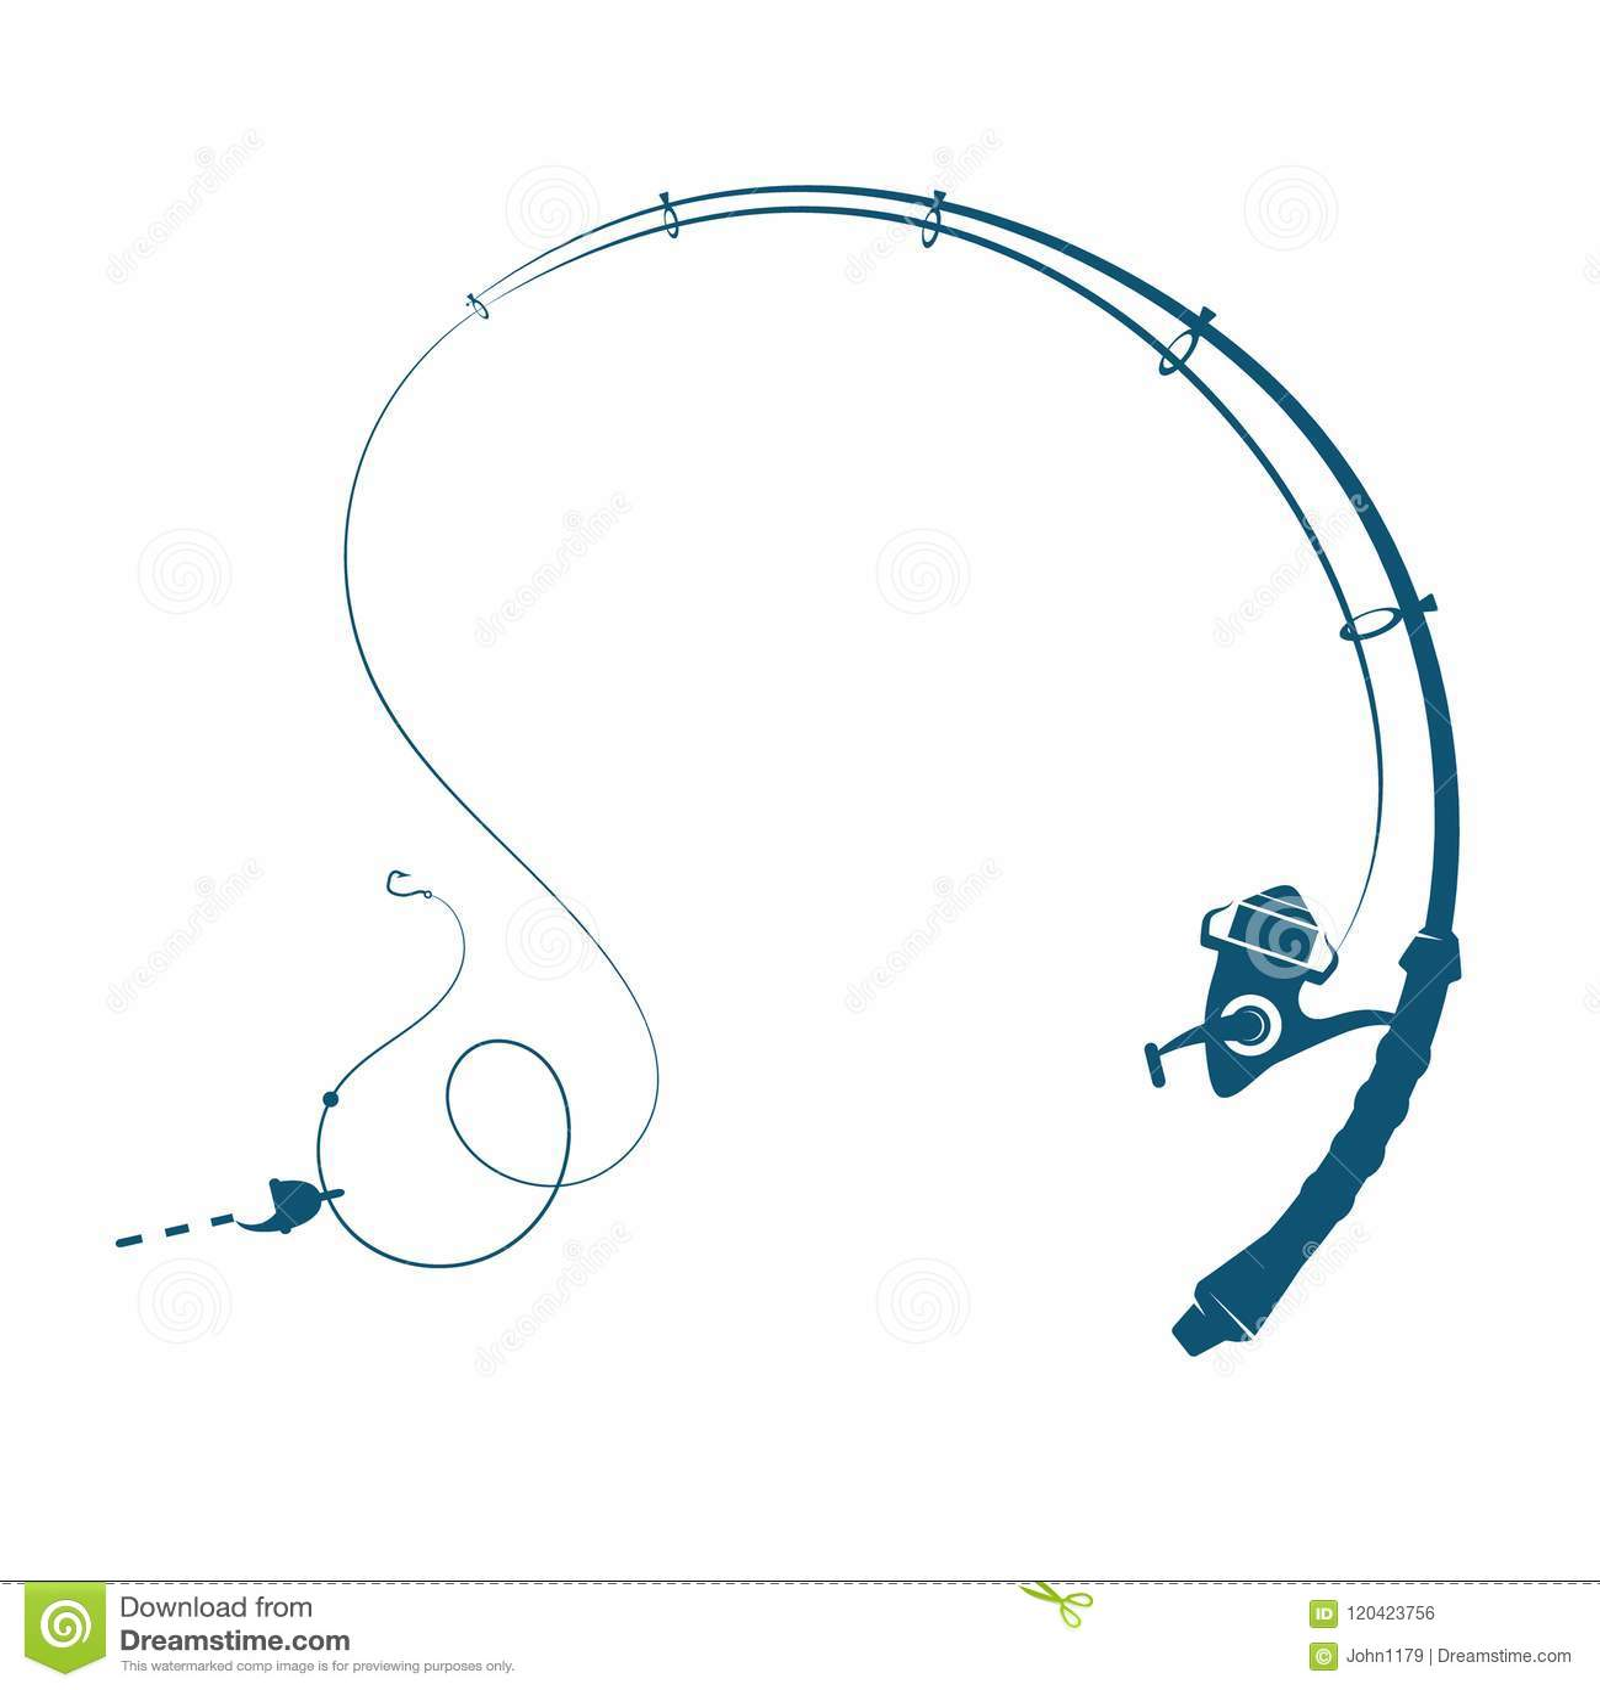 Fishing Rod Silhouette Stock Vector Illustration Of Handle 120423756